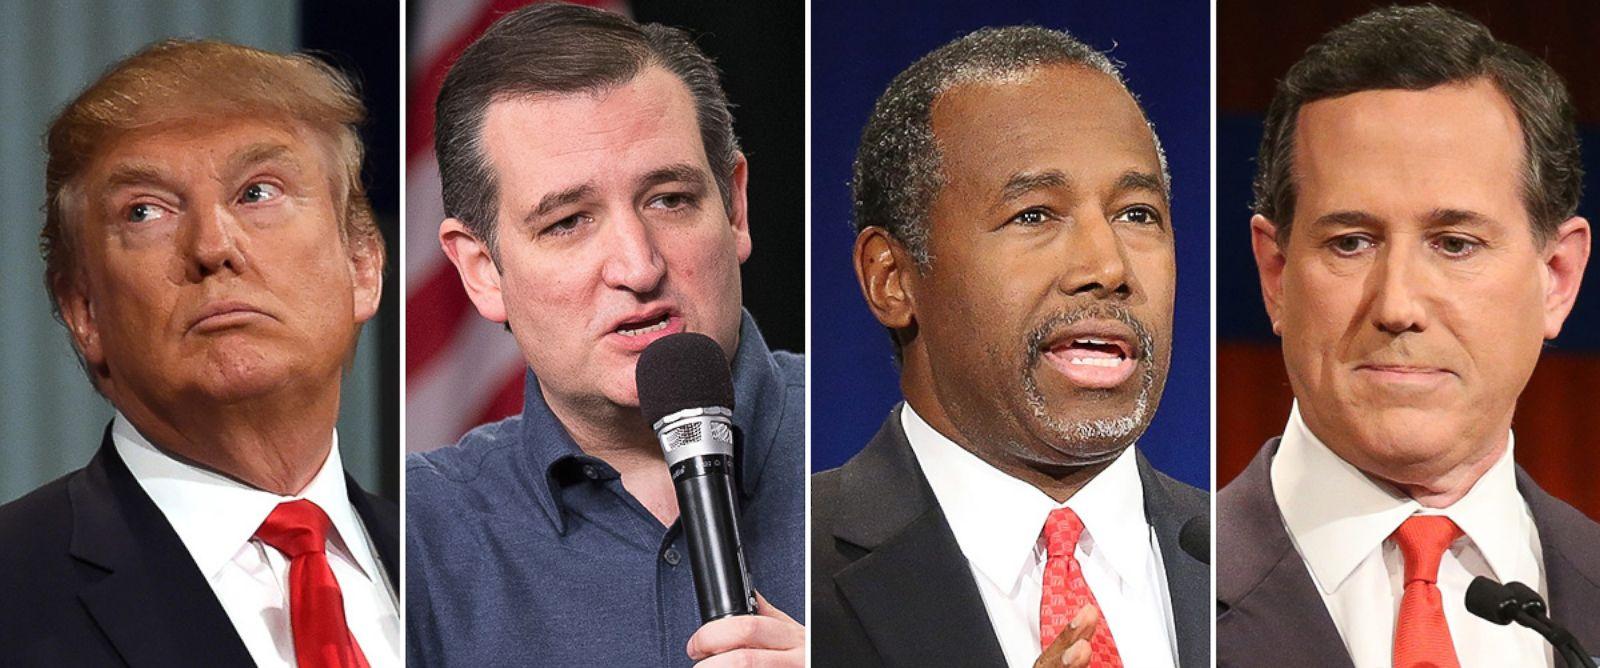 PHOTO: Donald Trump, Sen. Ted Cruz, Ben Carson and Rick Santorum.